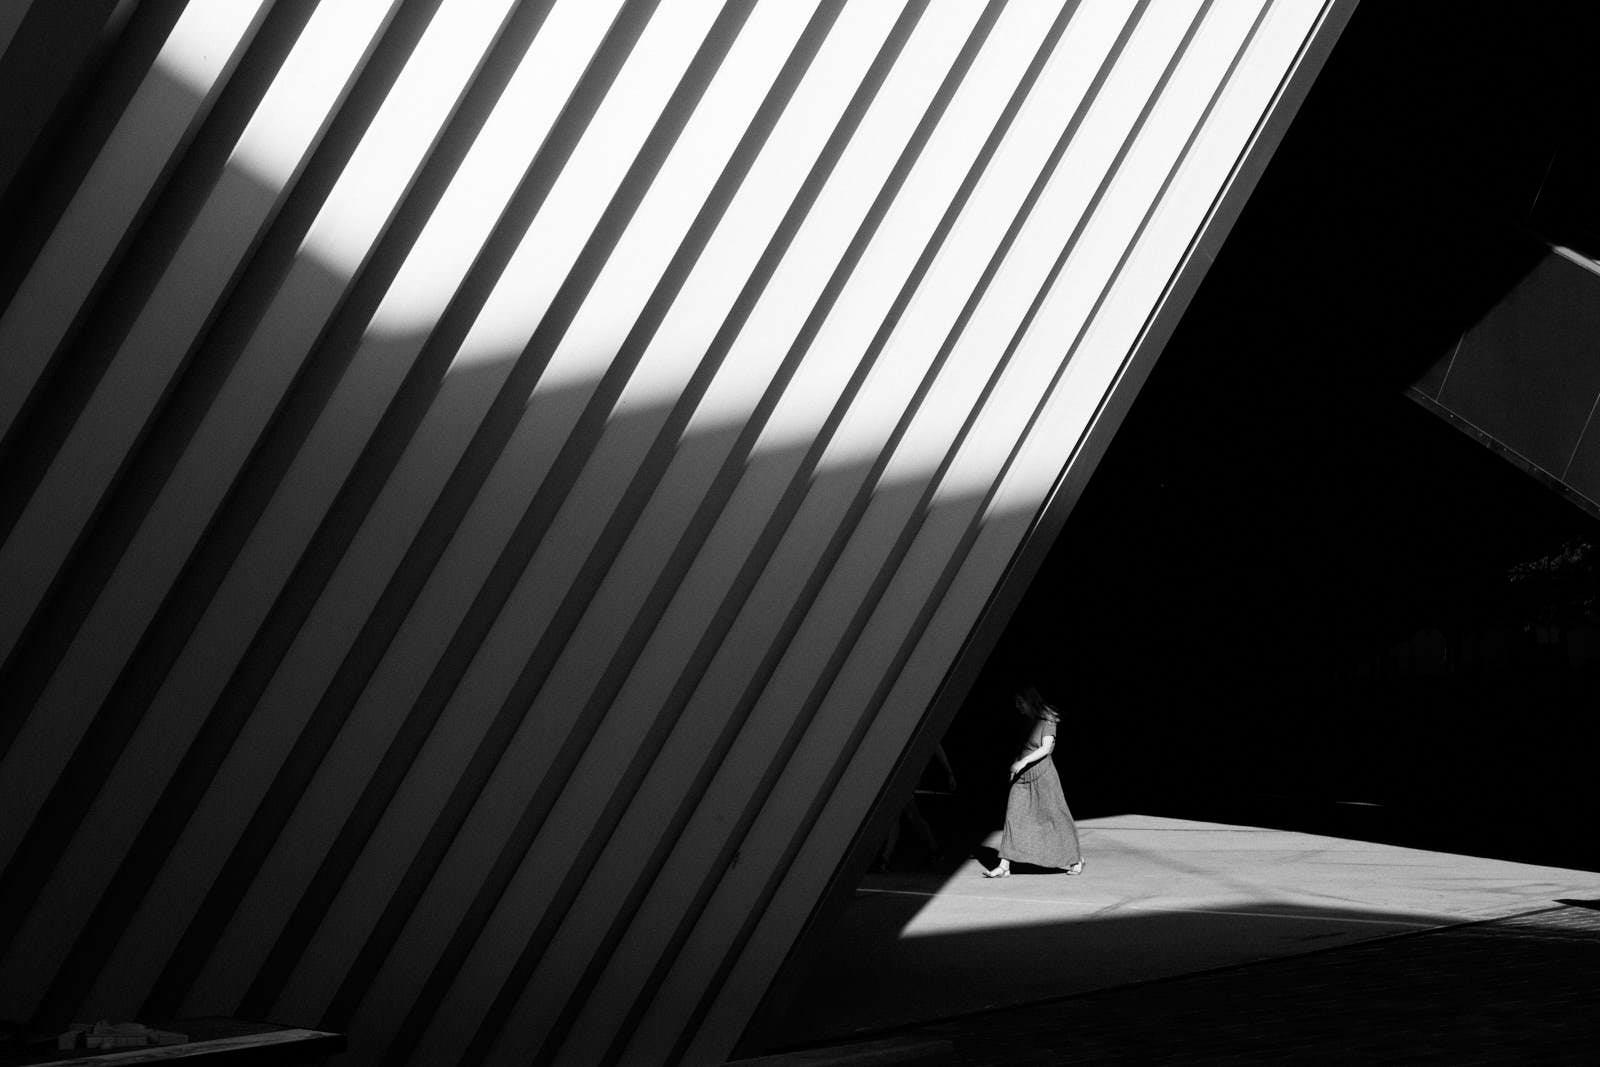 street photography graphics and minimalism